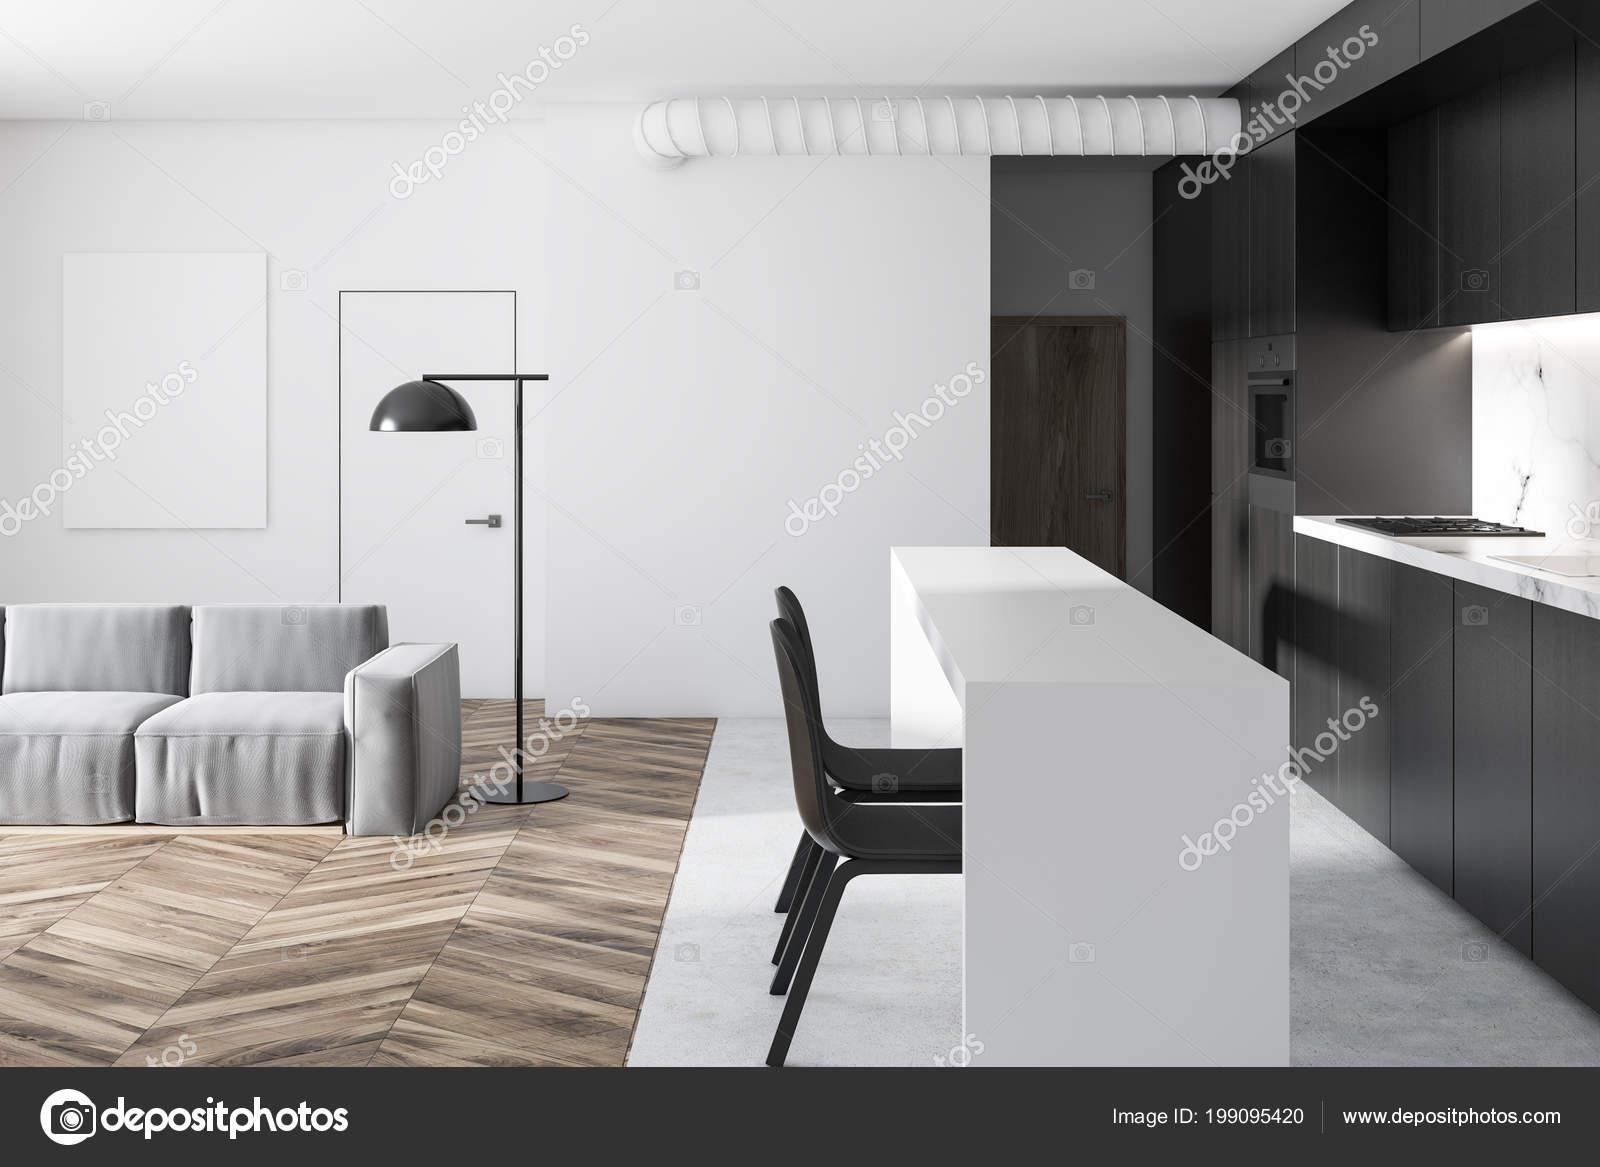 White Black Kitchen Living Room Interior Studio Wooden Marble Floor Stock Photo C Denisismagilov 199095420